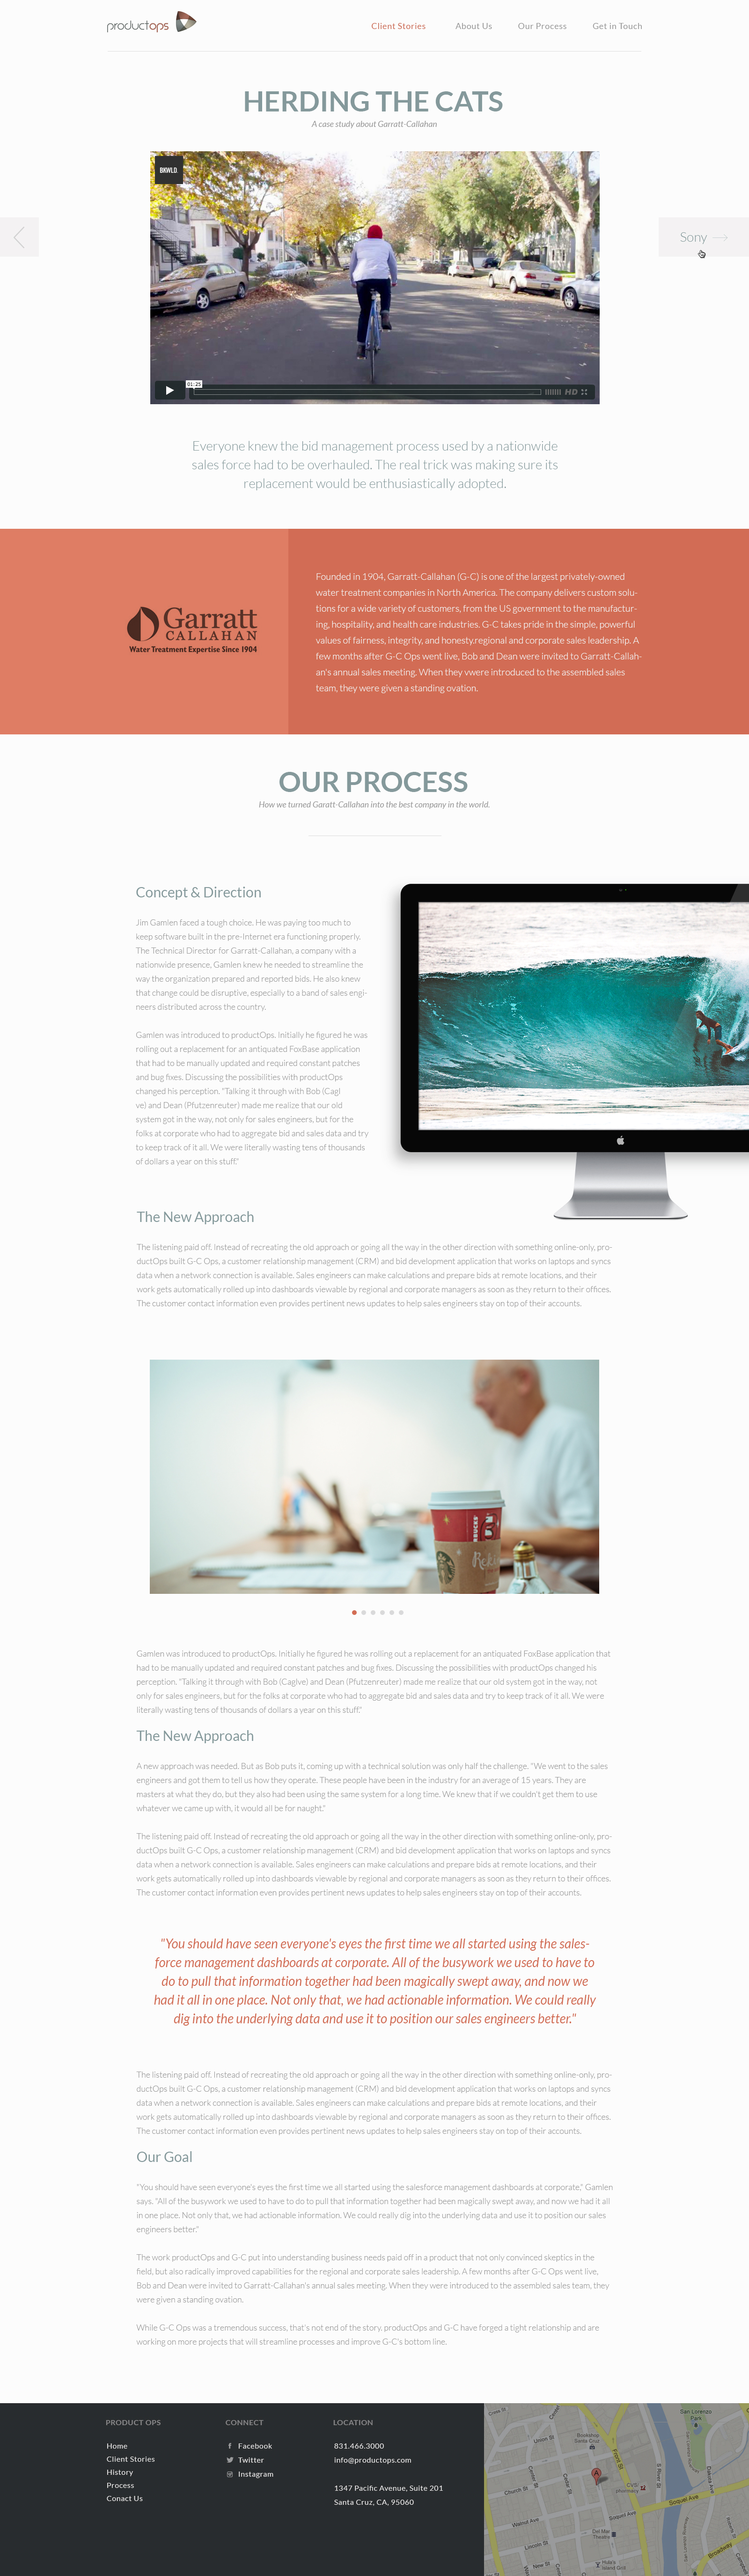 Dribbble Real Pixels Jpg By Charlie Waite Web Template Design Interactive Design Web Design Inspiration